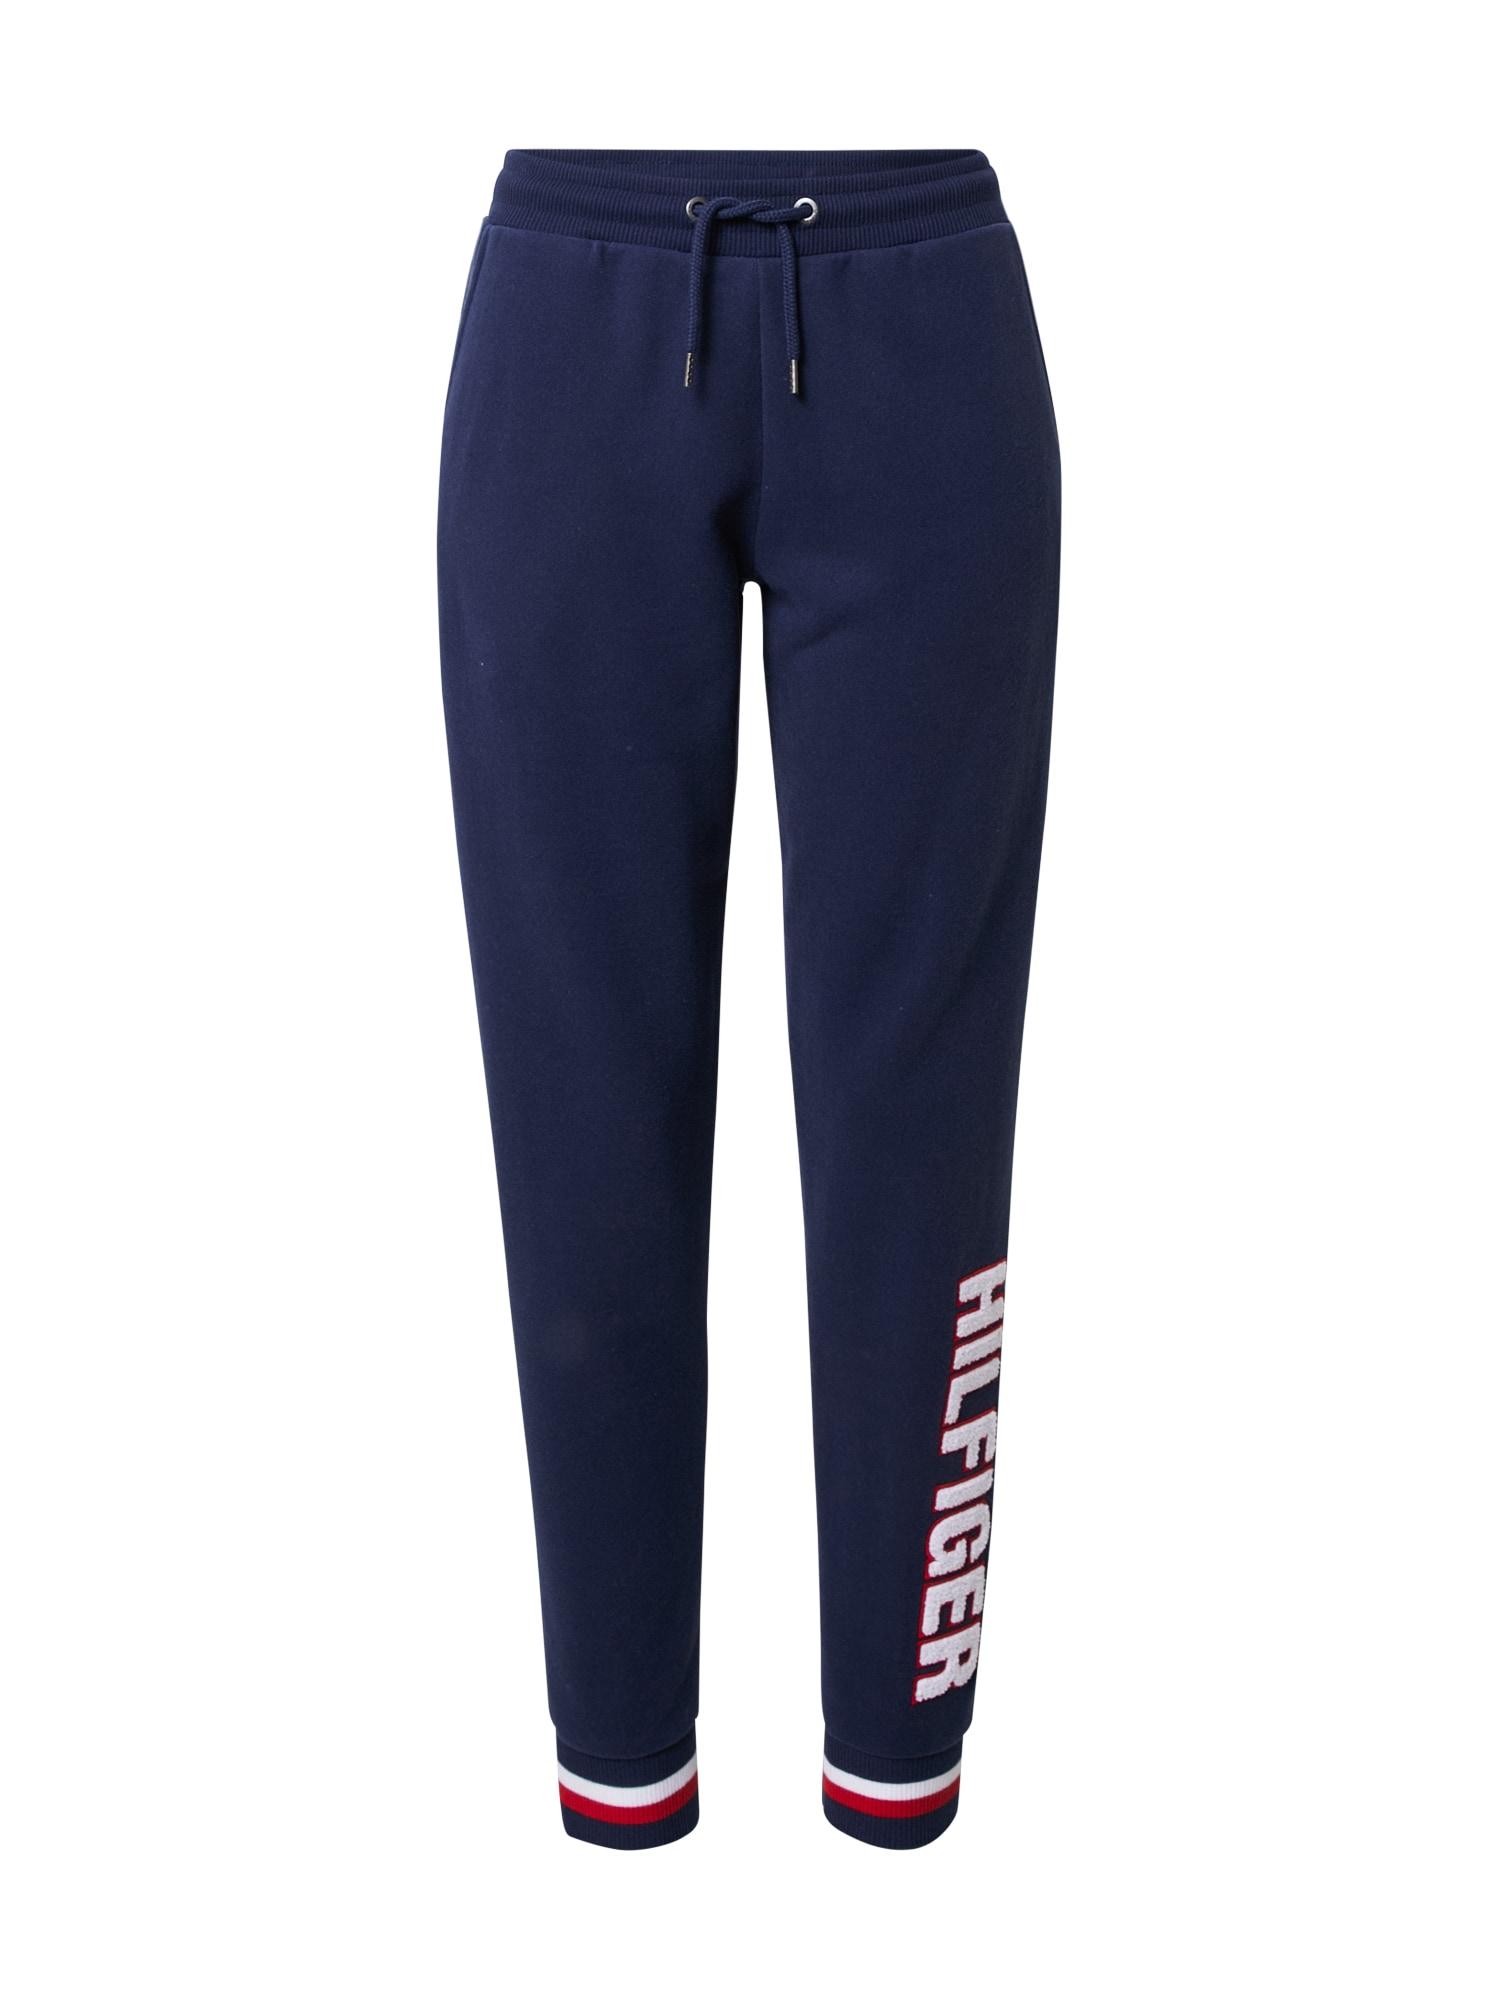 Tommy Hilfiger Underwear Kelnės tamsiai mėlyna / melionų spalva / balta